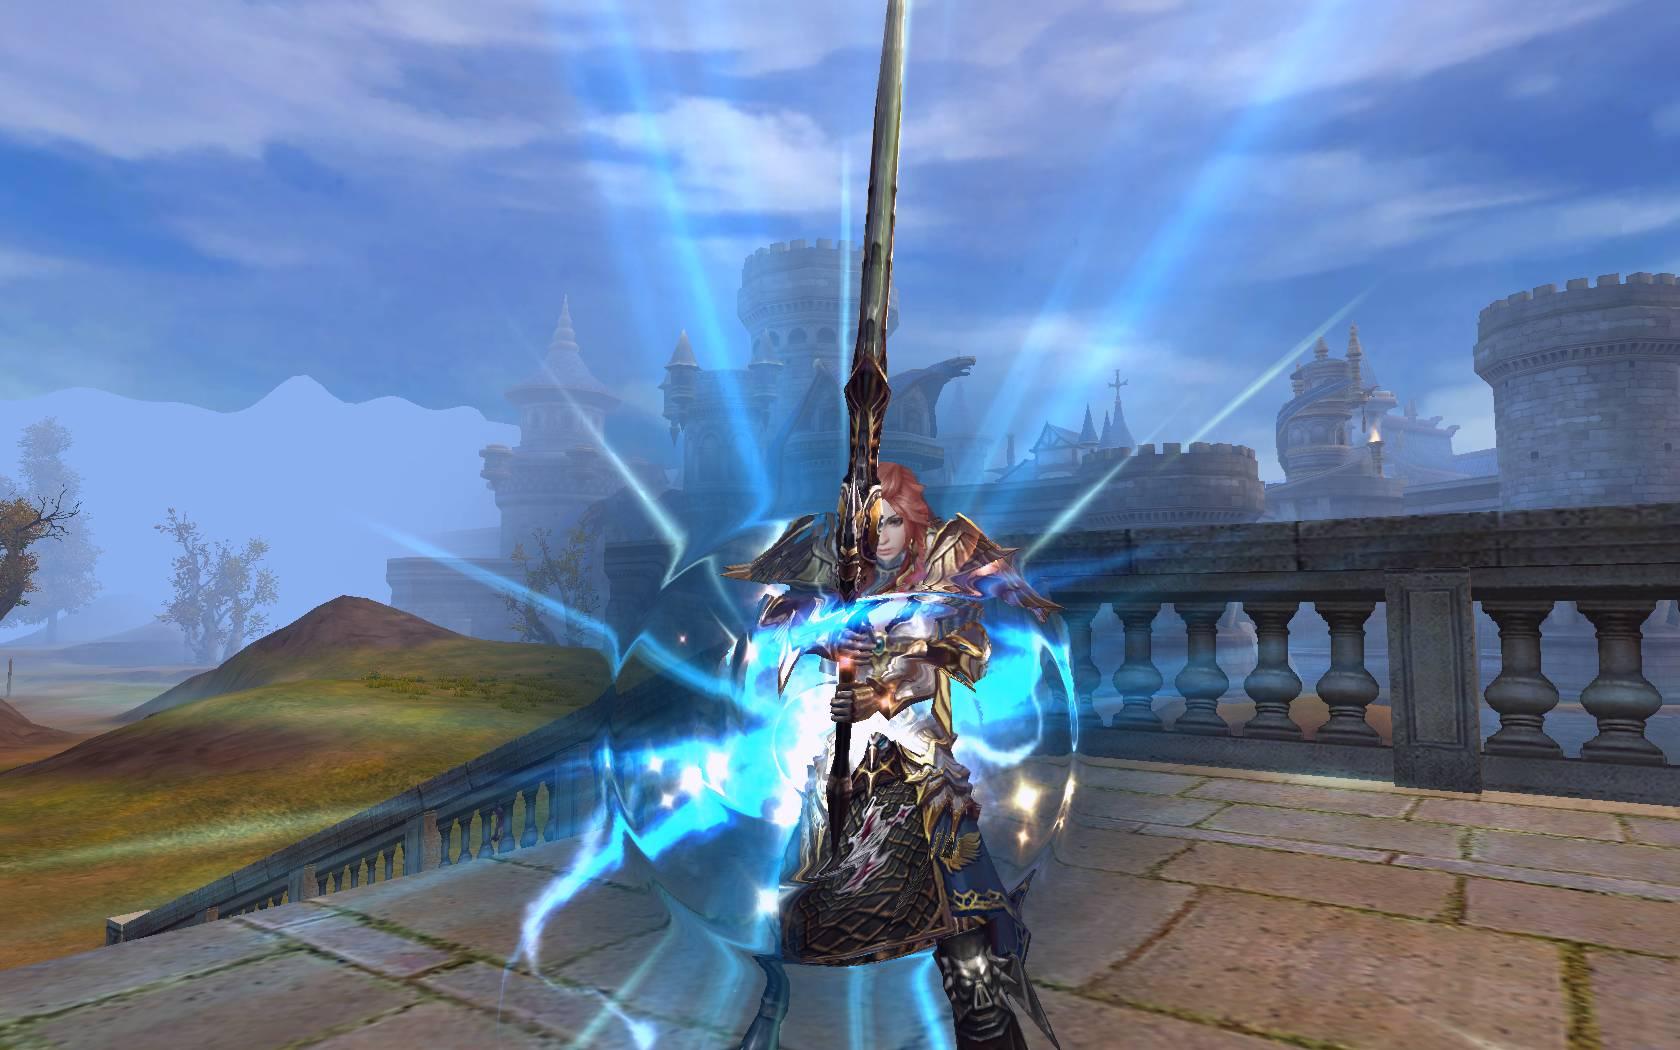 Click image for larger version.Name:Warriorclass Forsaken World03.jpgViews:171Size:162.0 KBID:1059